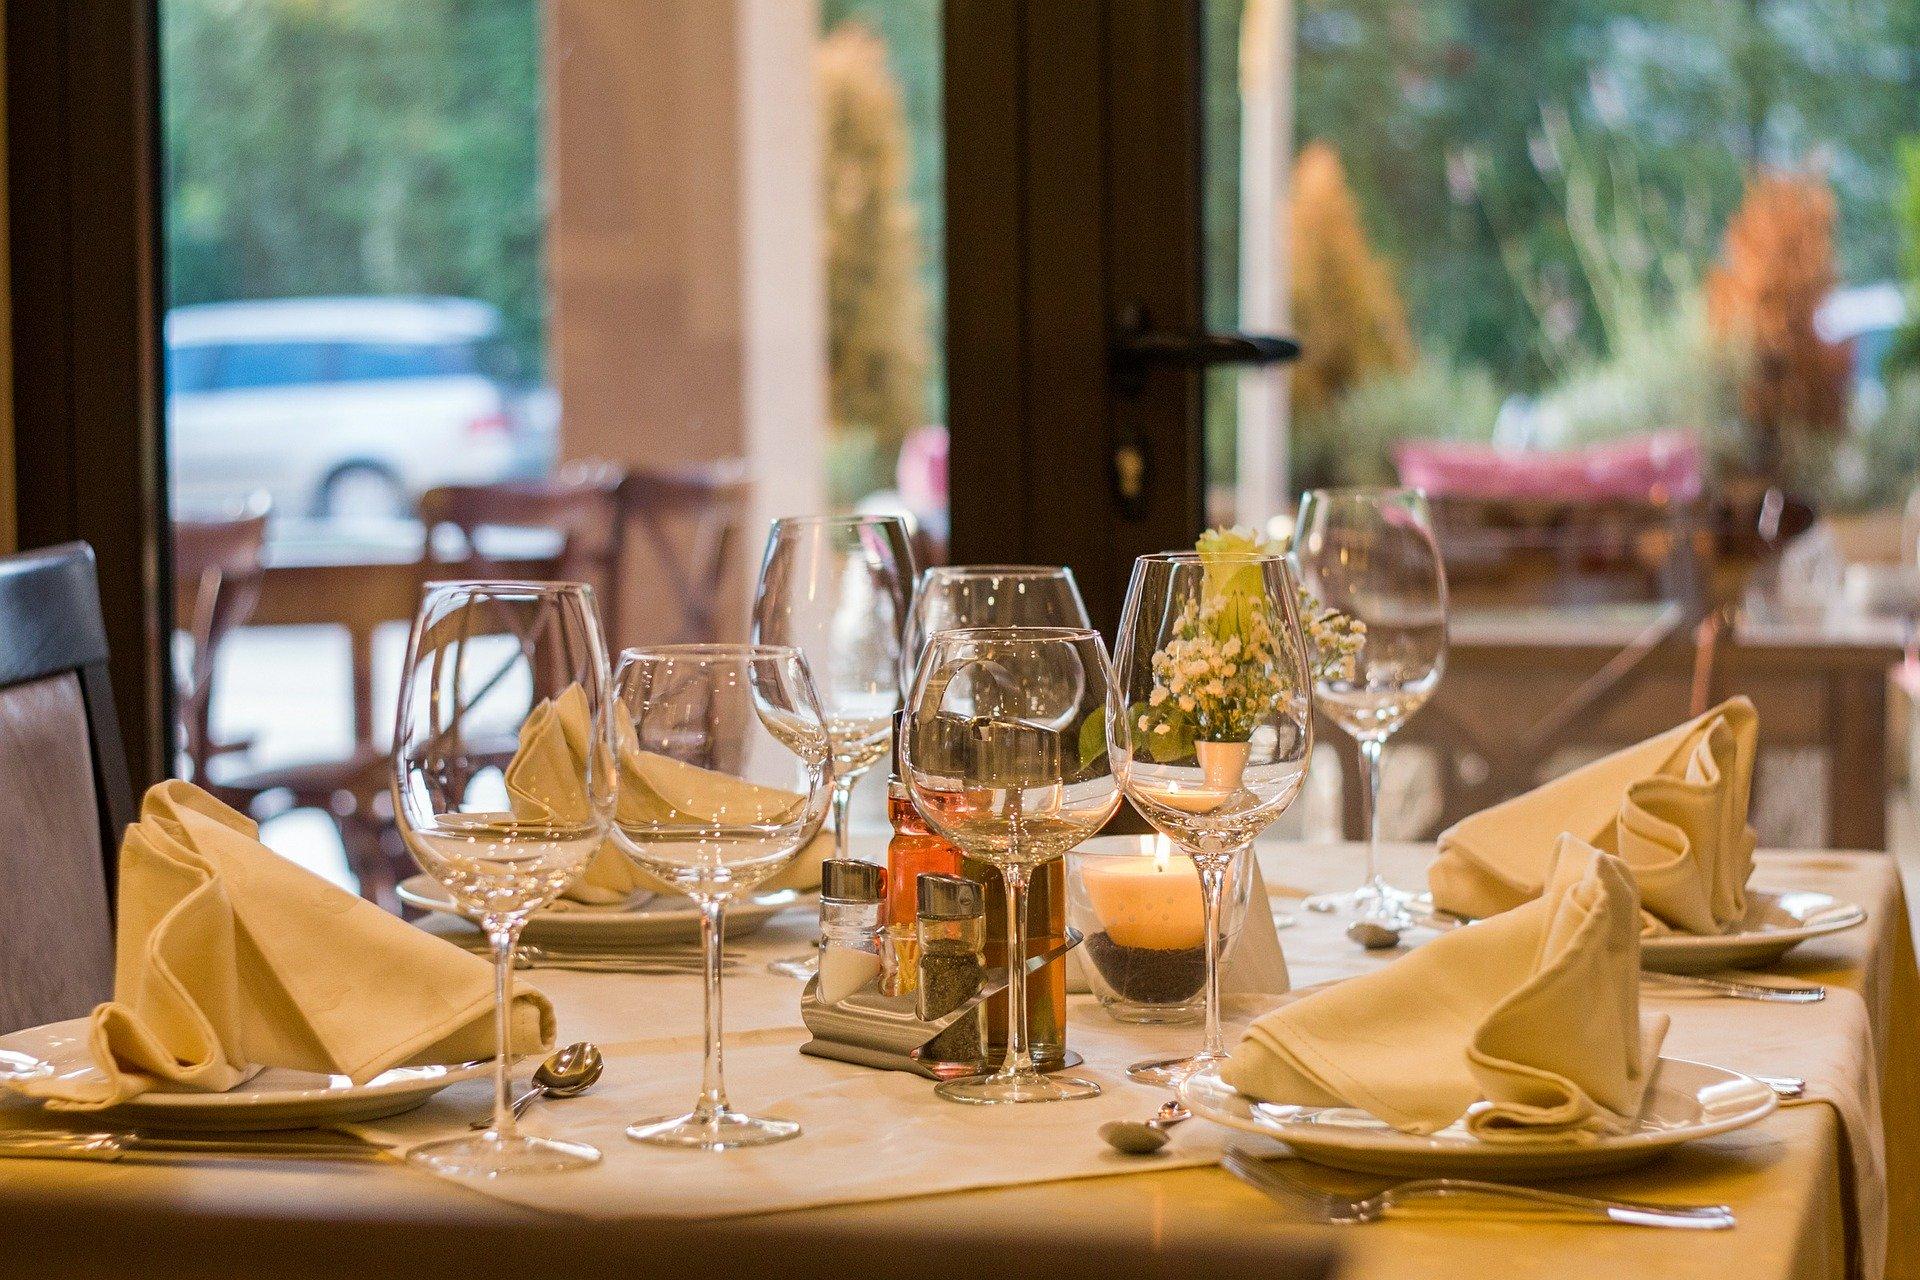 70 - Hospitality Part 2